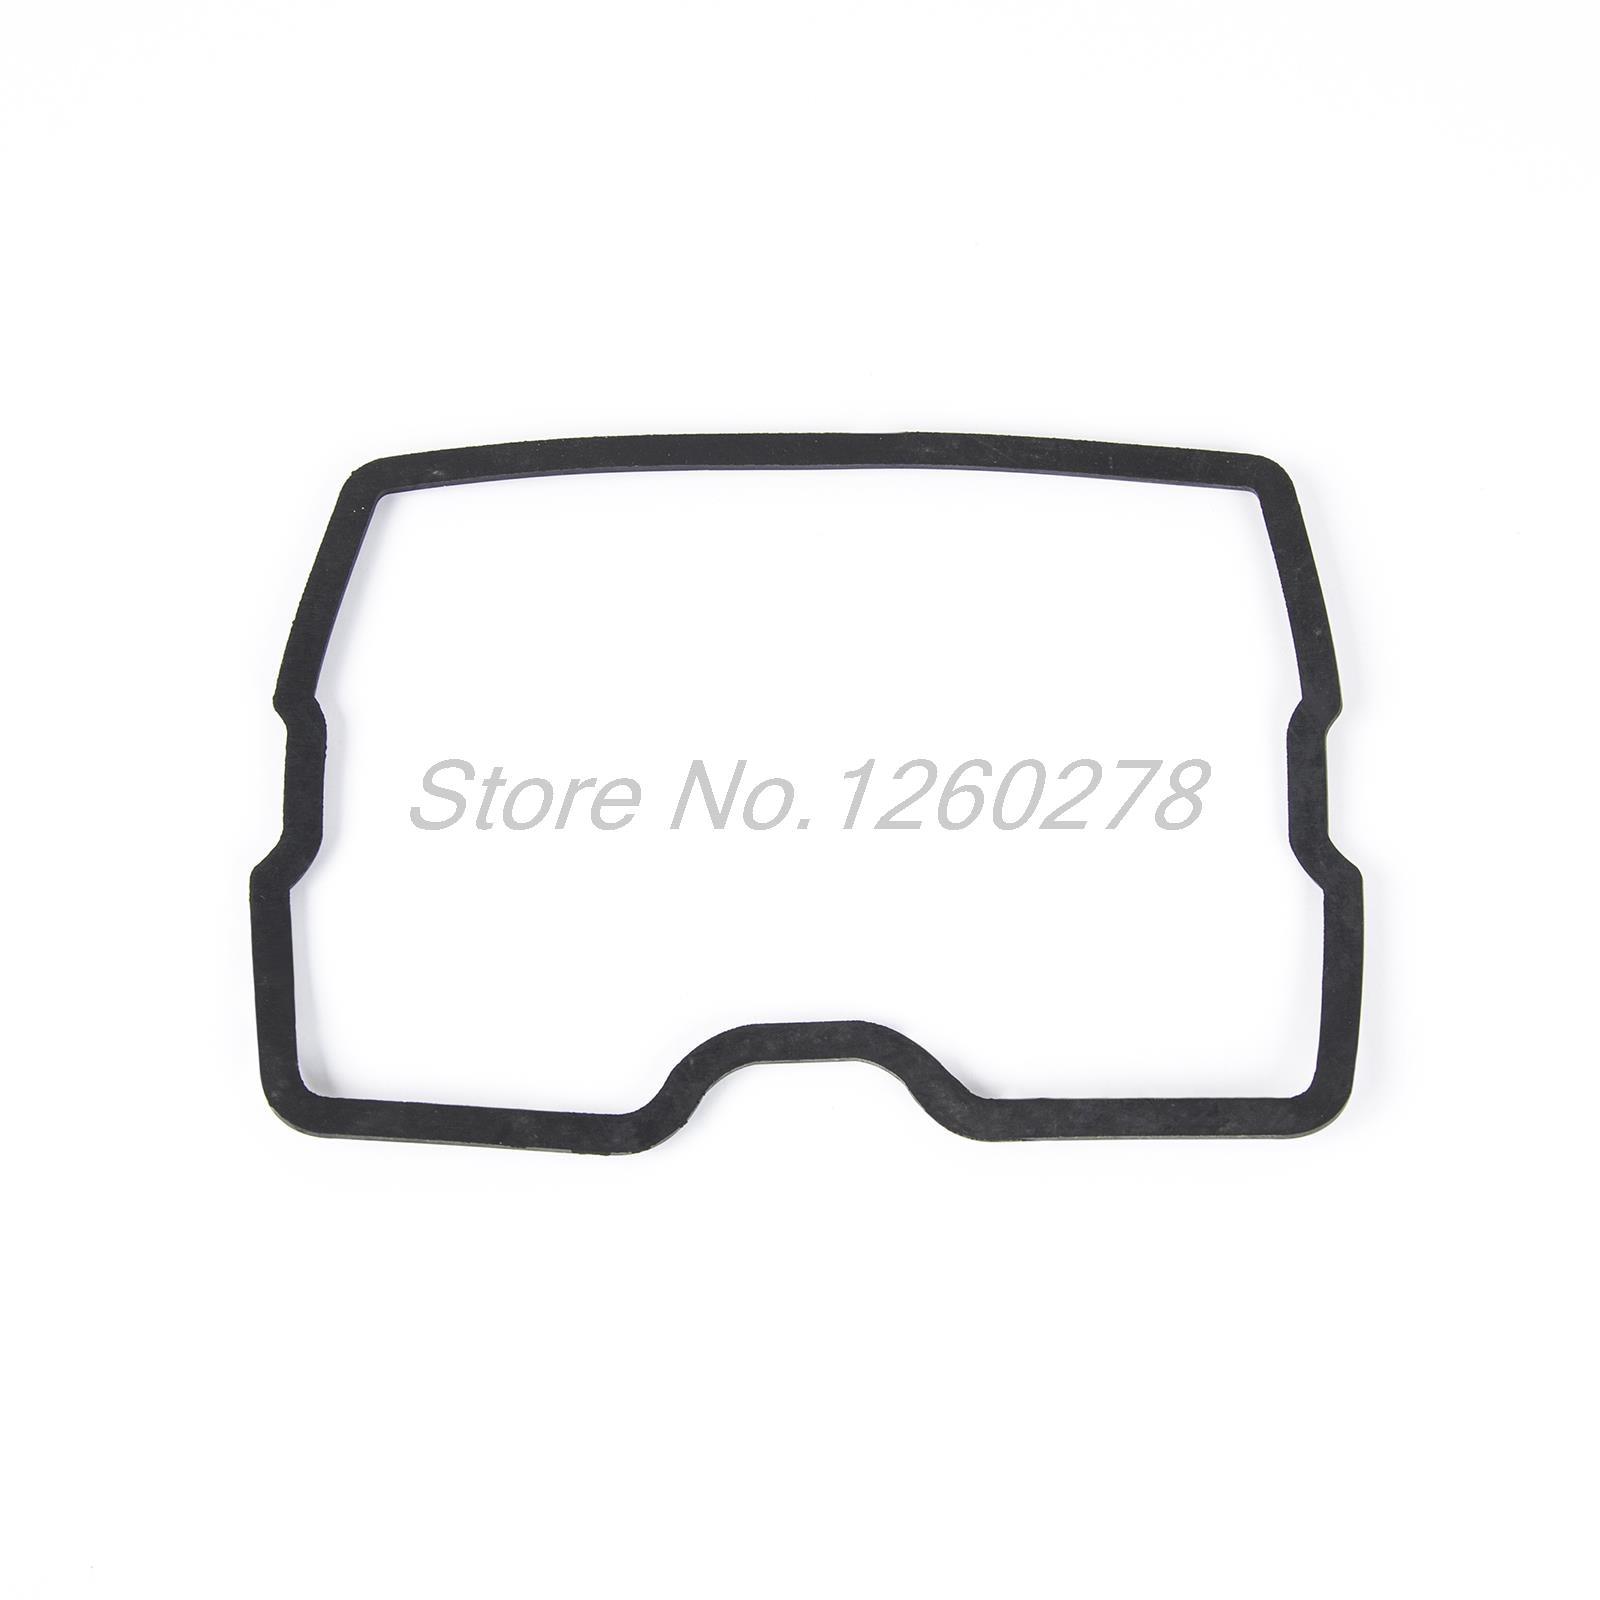 Cylinder Head Cover Gasket For Honda Rebel Cmx250 Ca250